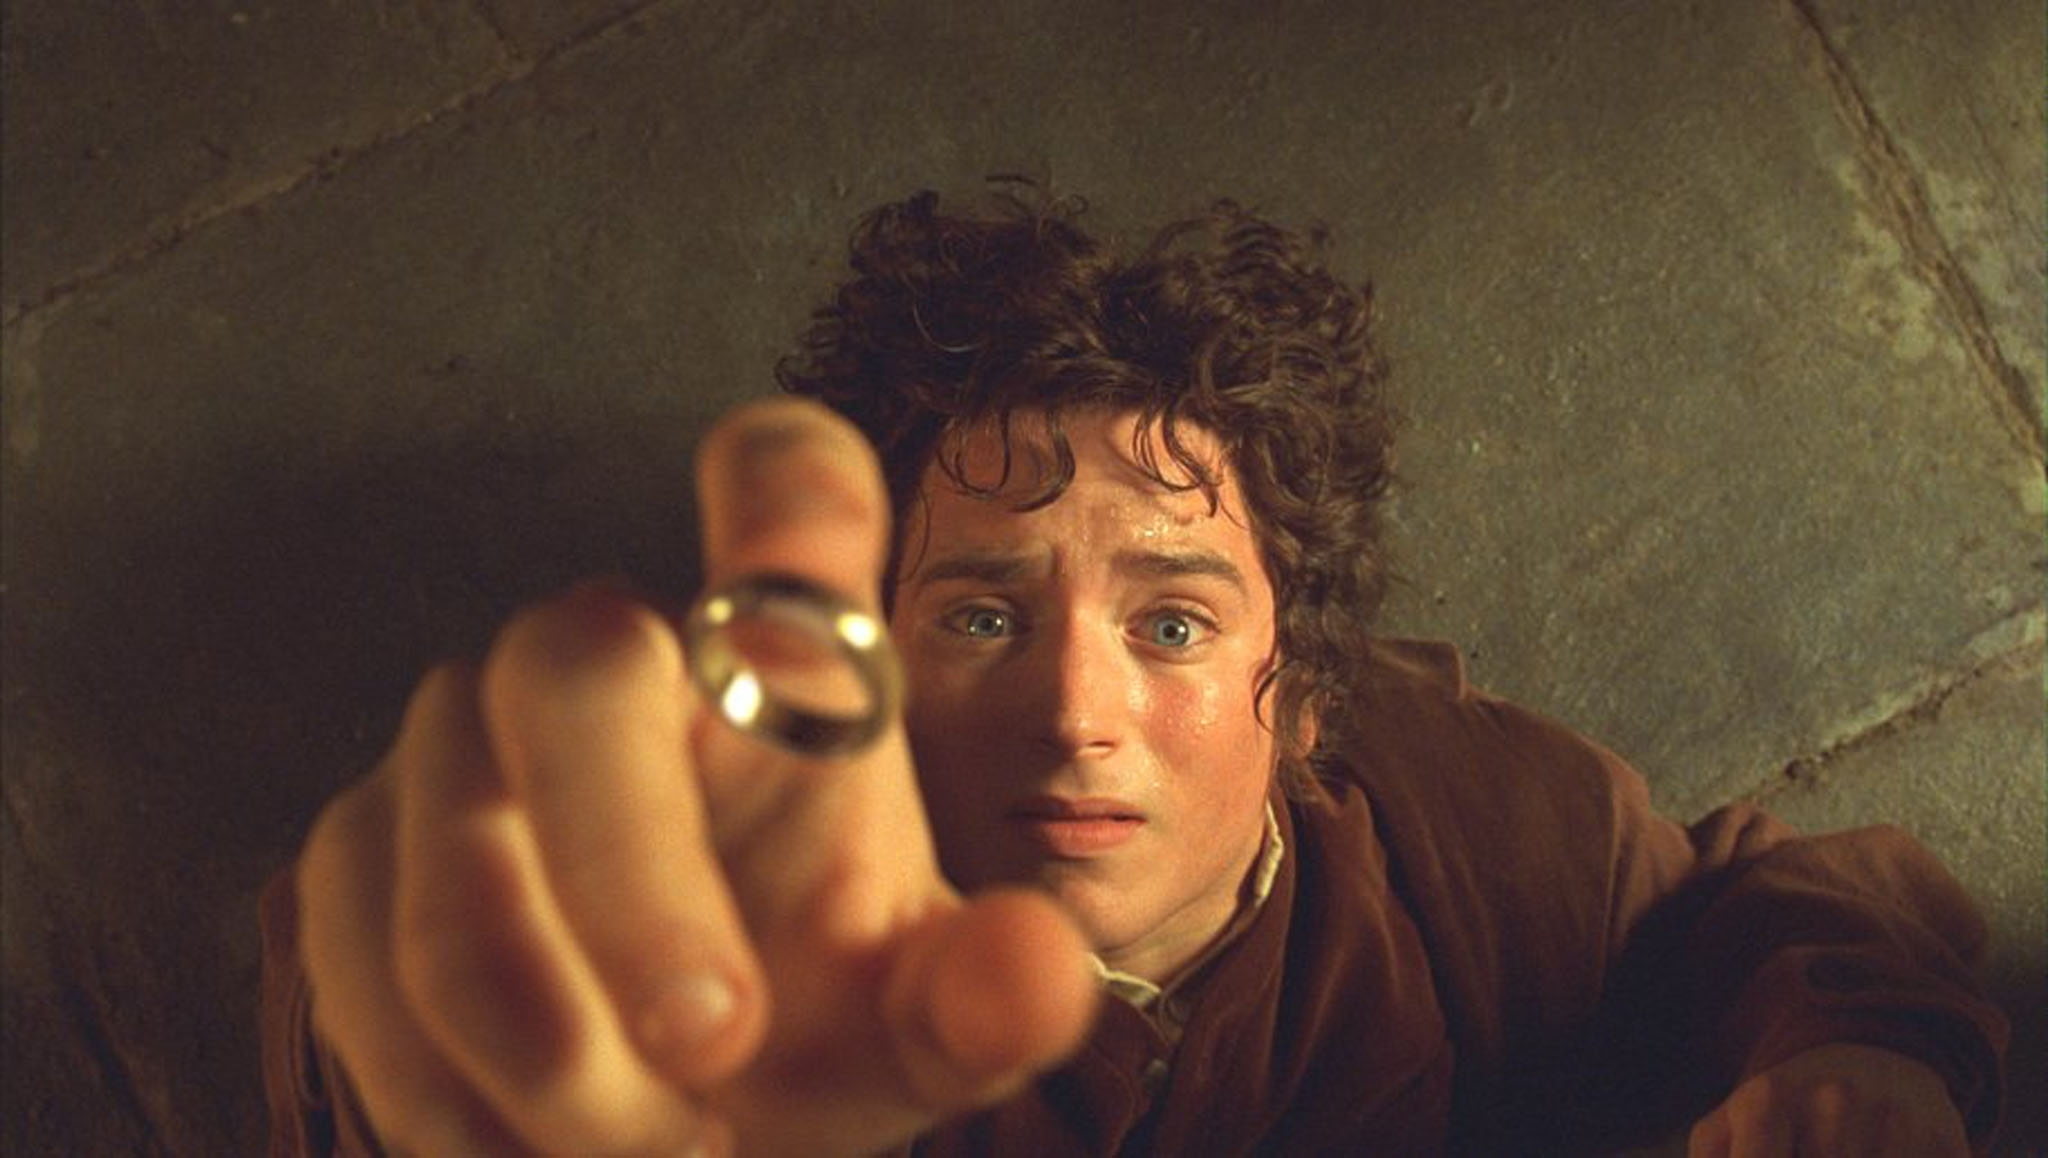 Elijah Wood Lord of the Rings